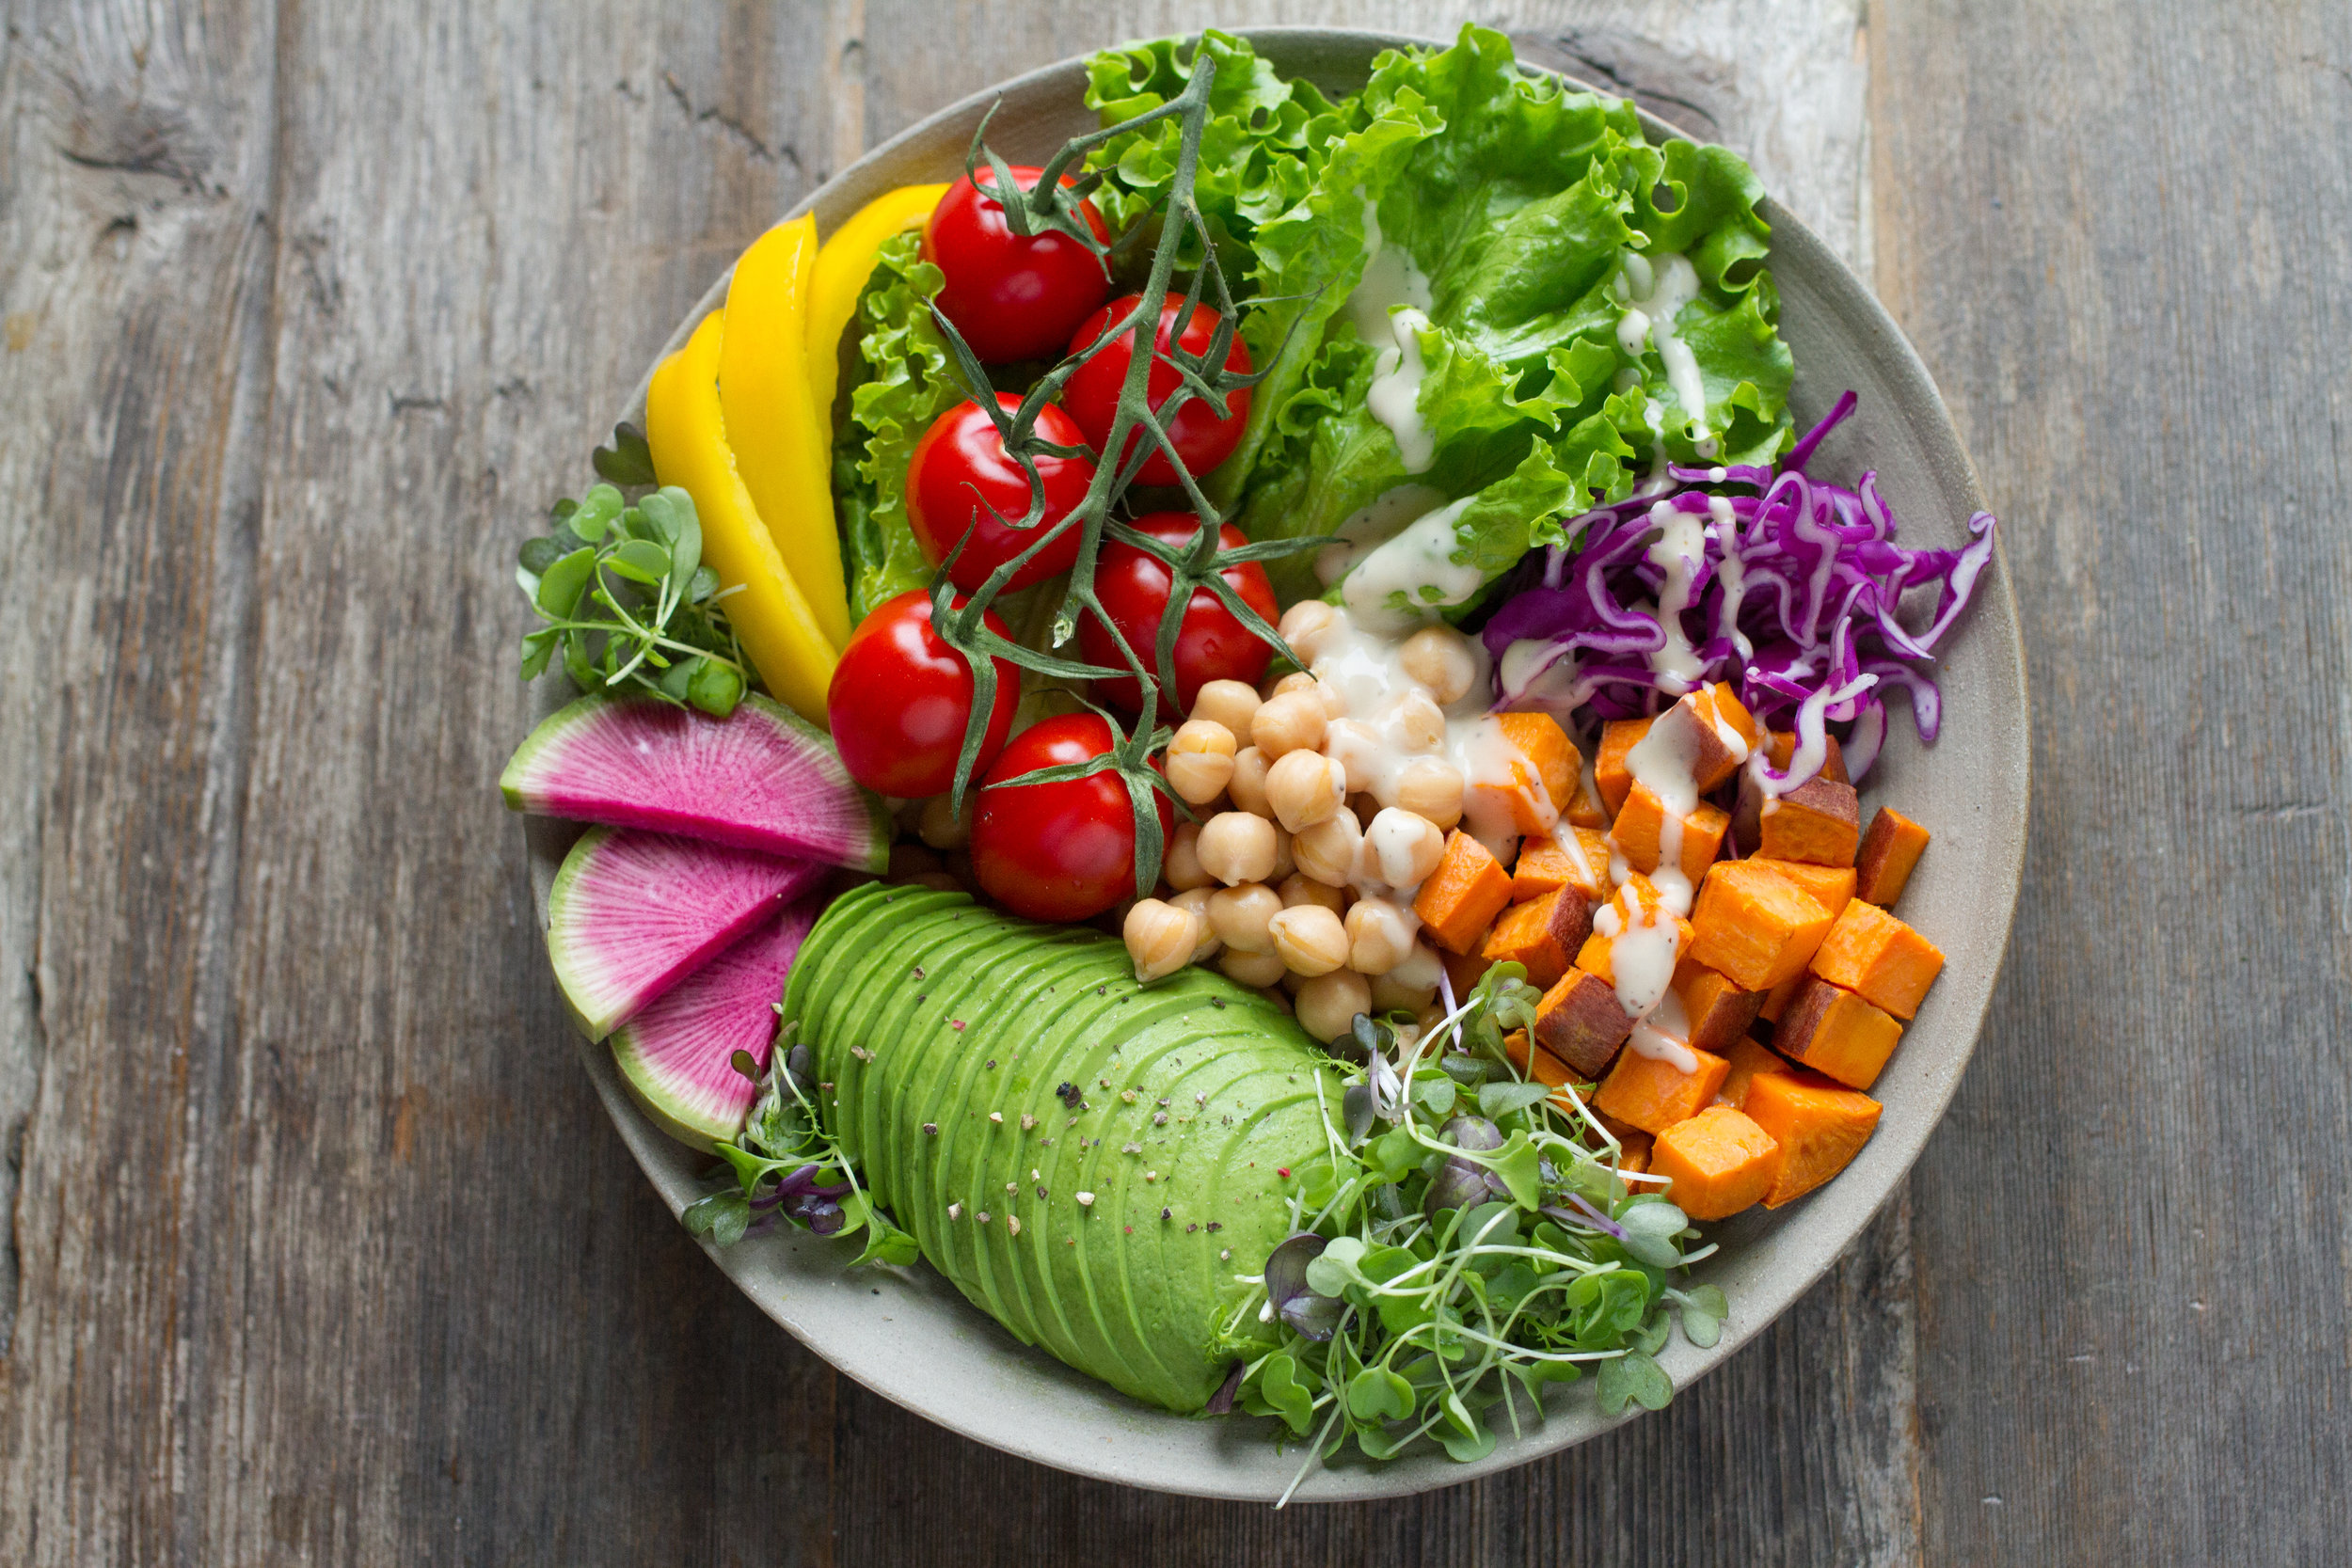 healthy foods voyedge rx